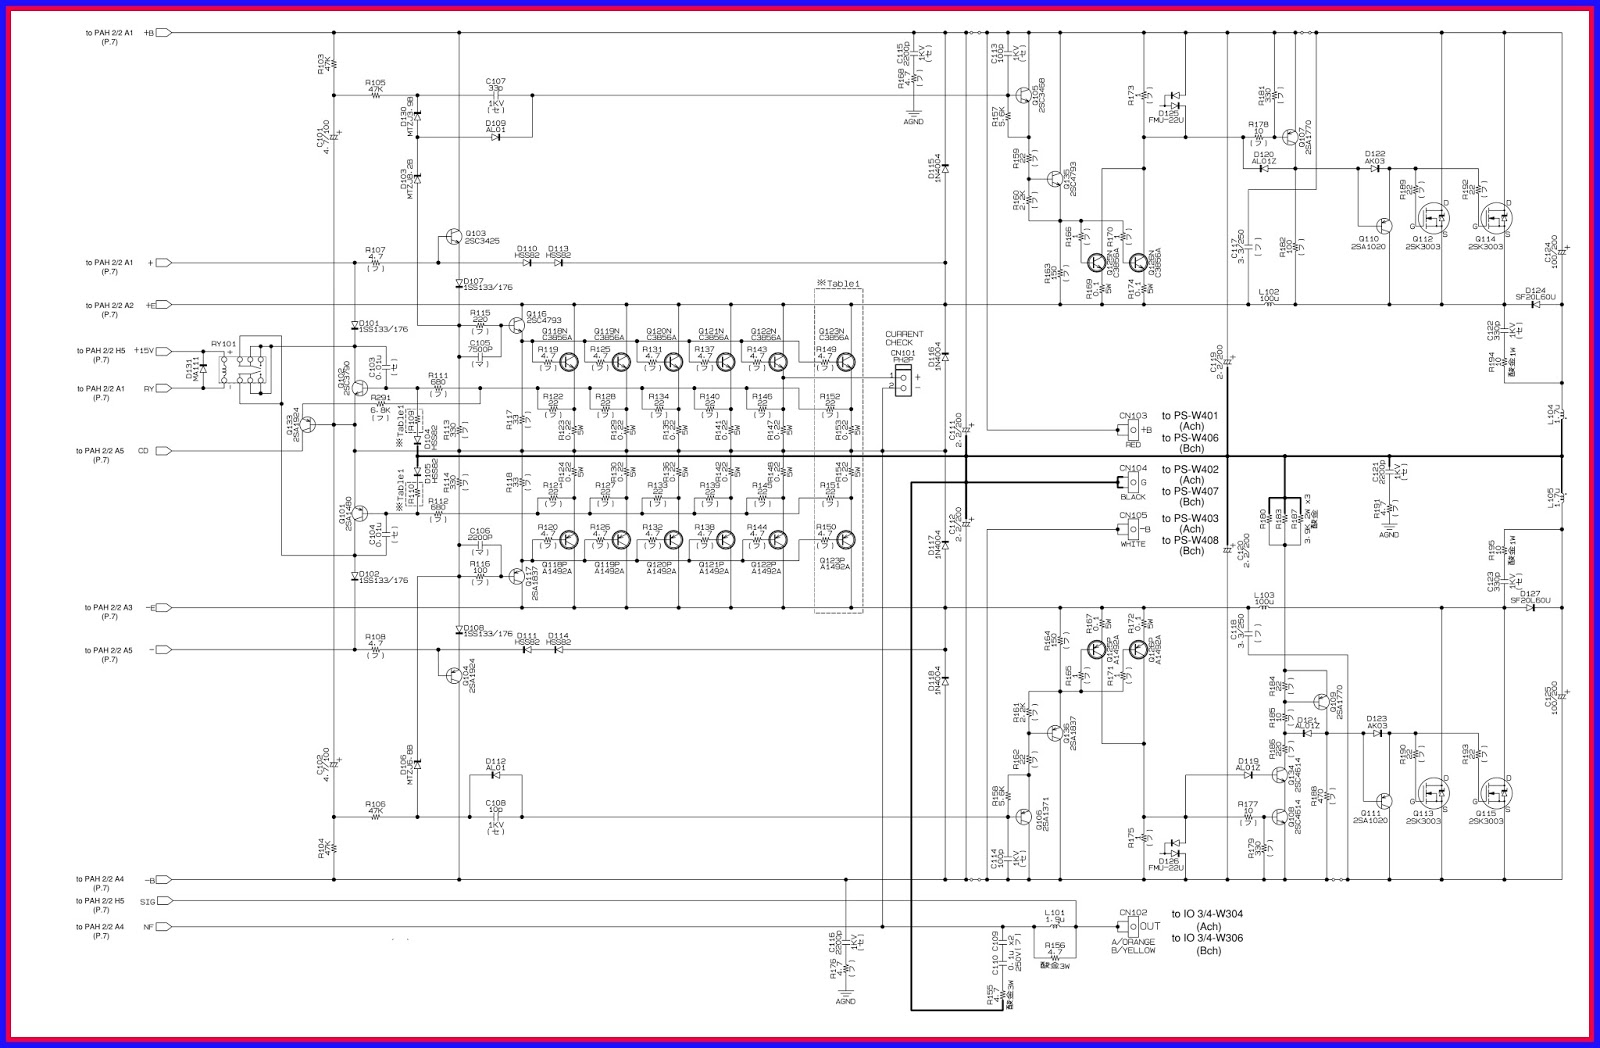 hight resolution of yamaha amp schematic wiring diagram technicyamaha amp schematic wiring diagram insideyamaha amp schematic wiring diagram expert